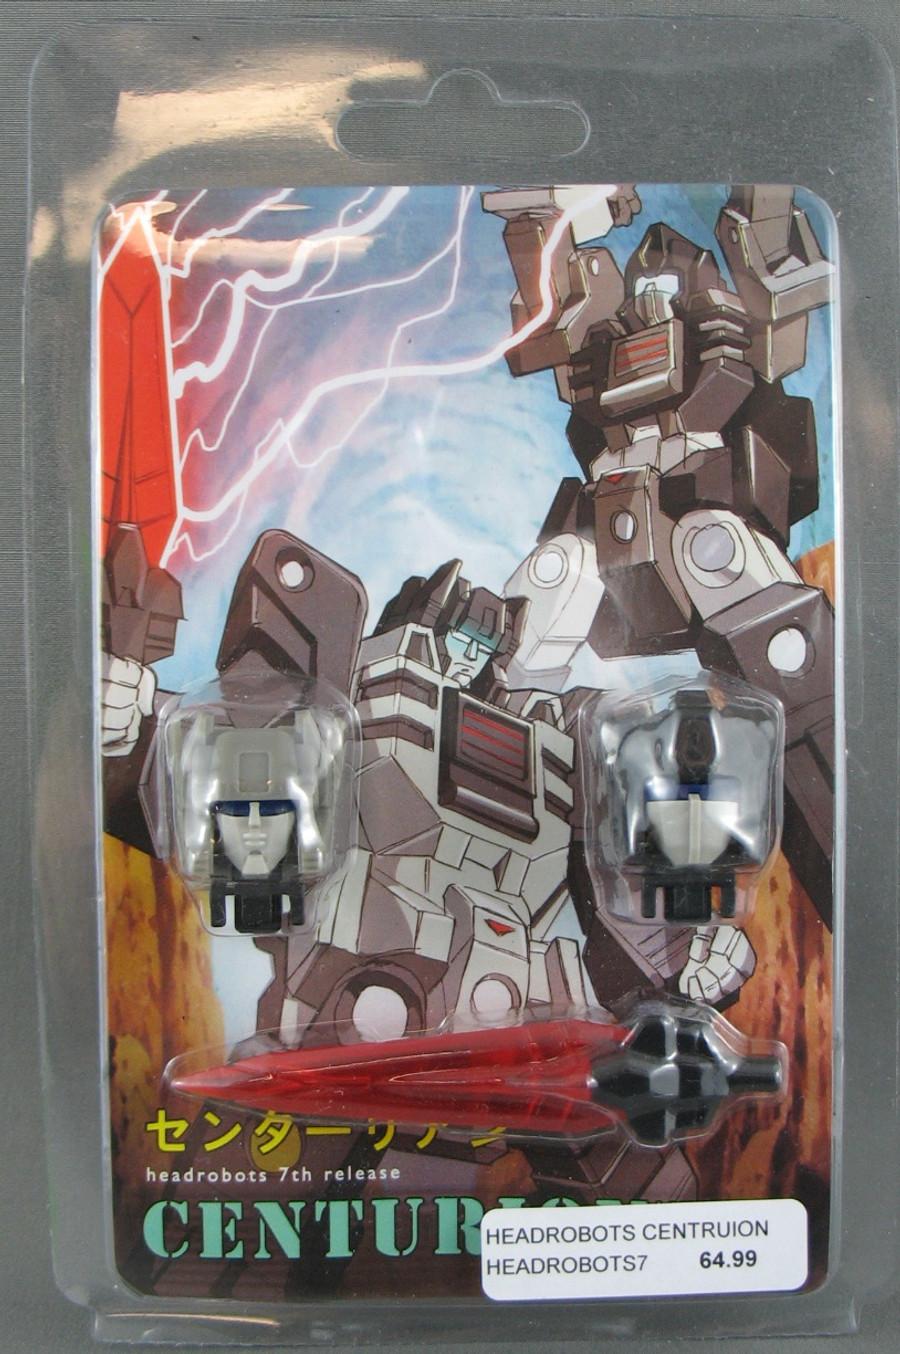 Headrobots - Centurion